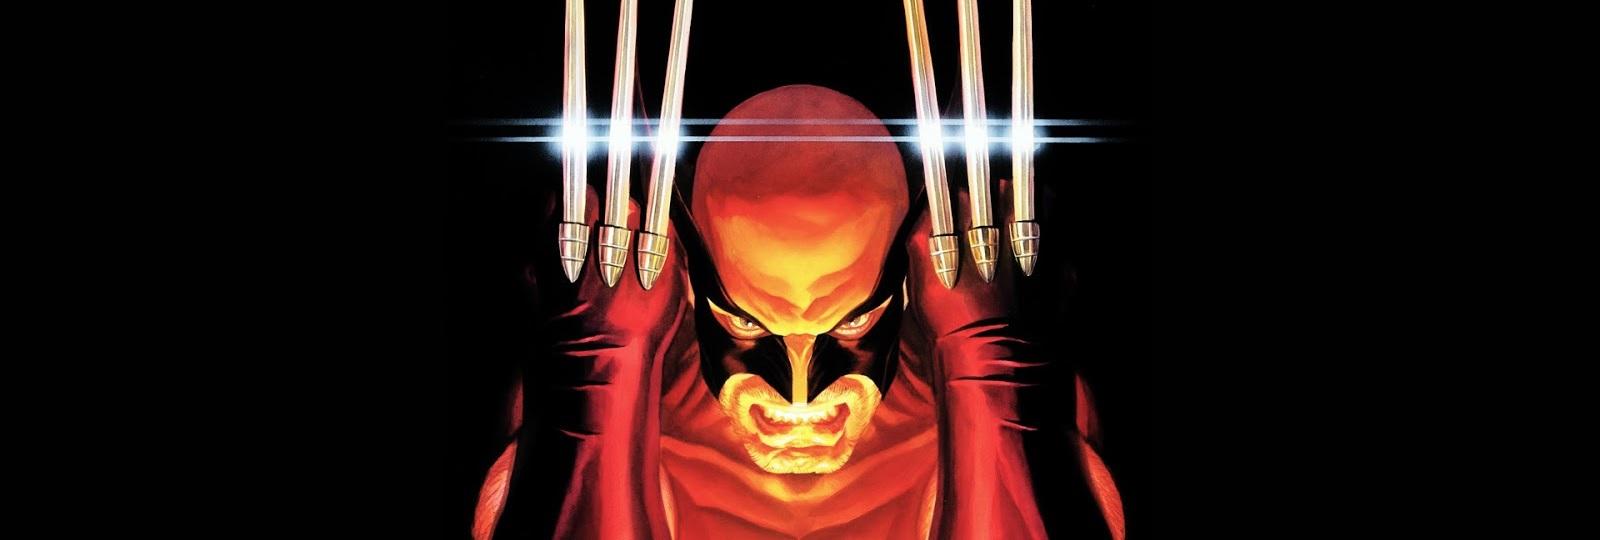 Top 5 Wolverine Stories